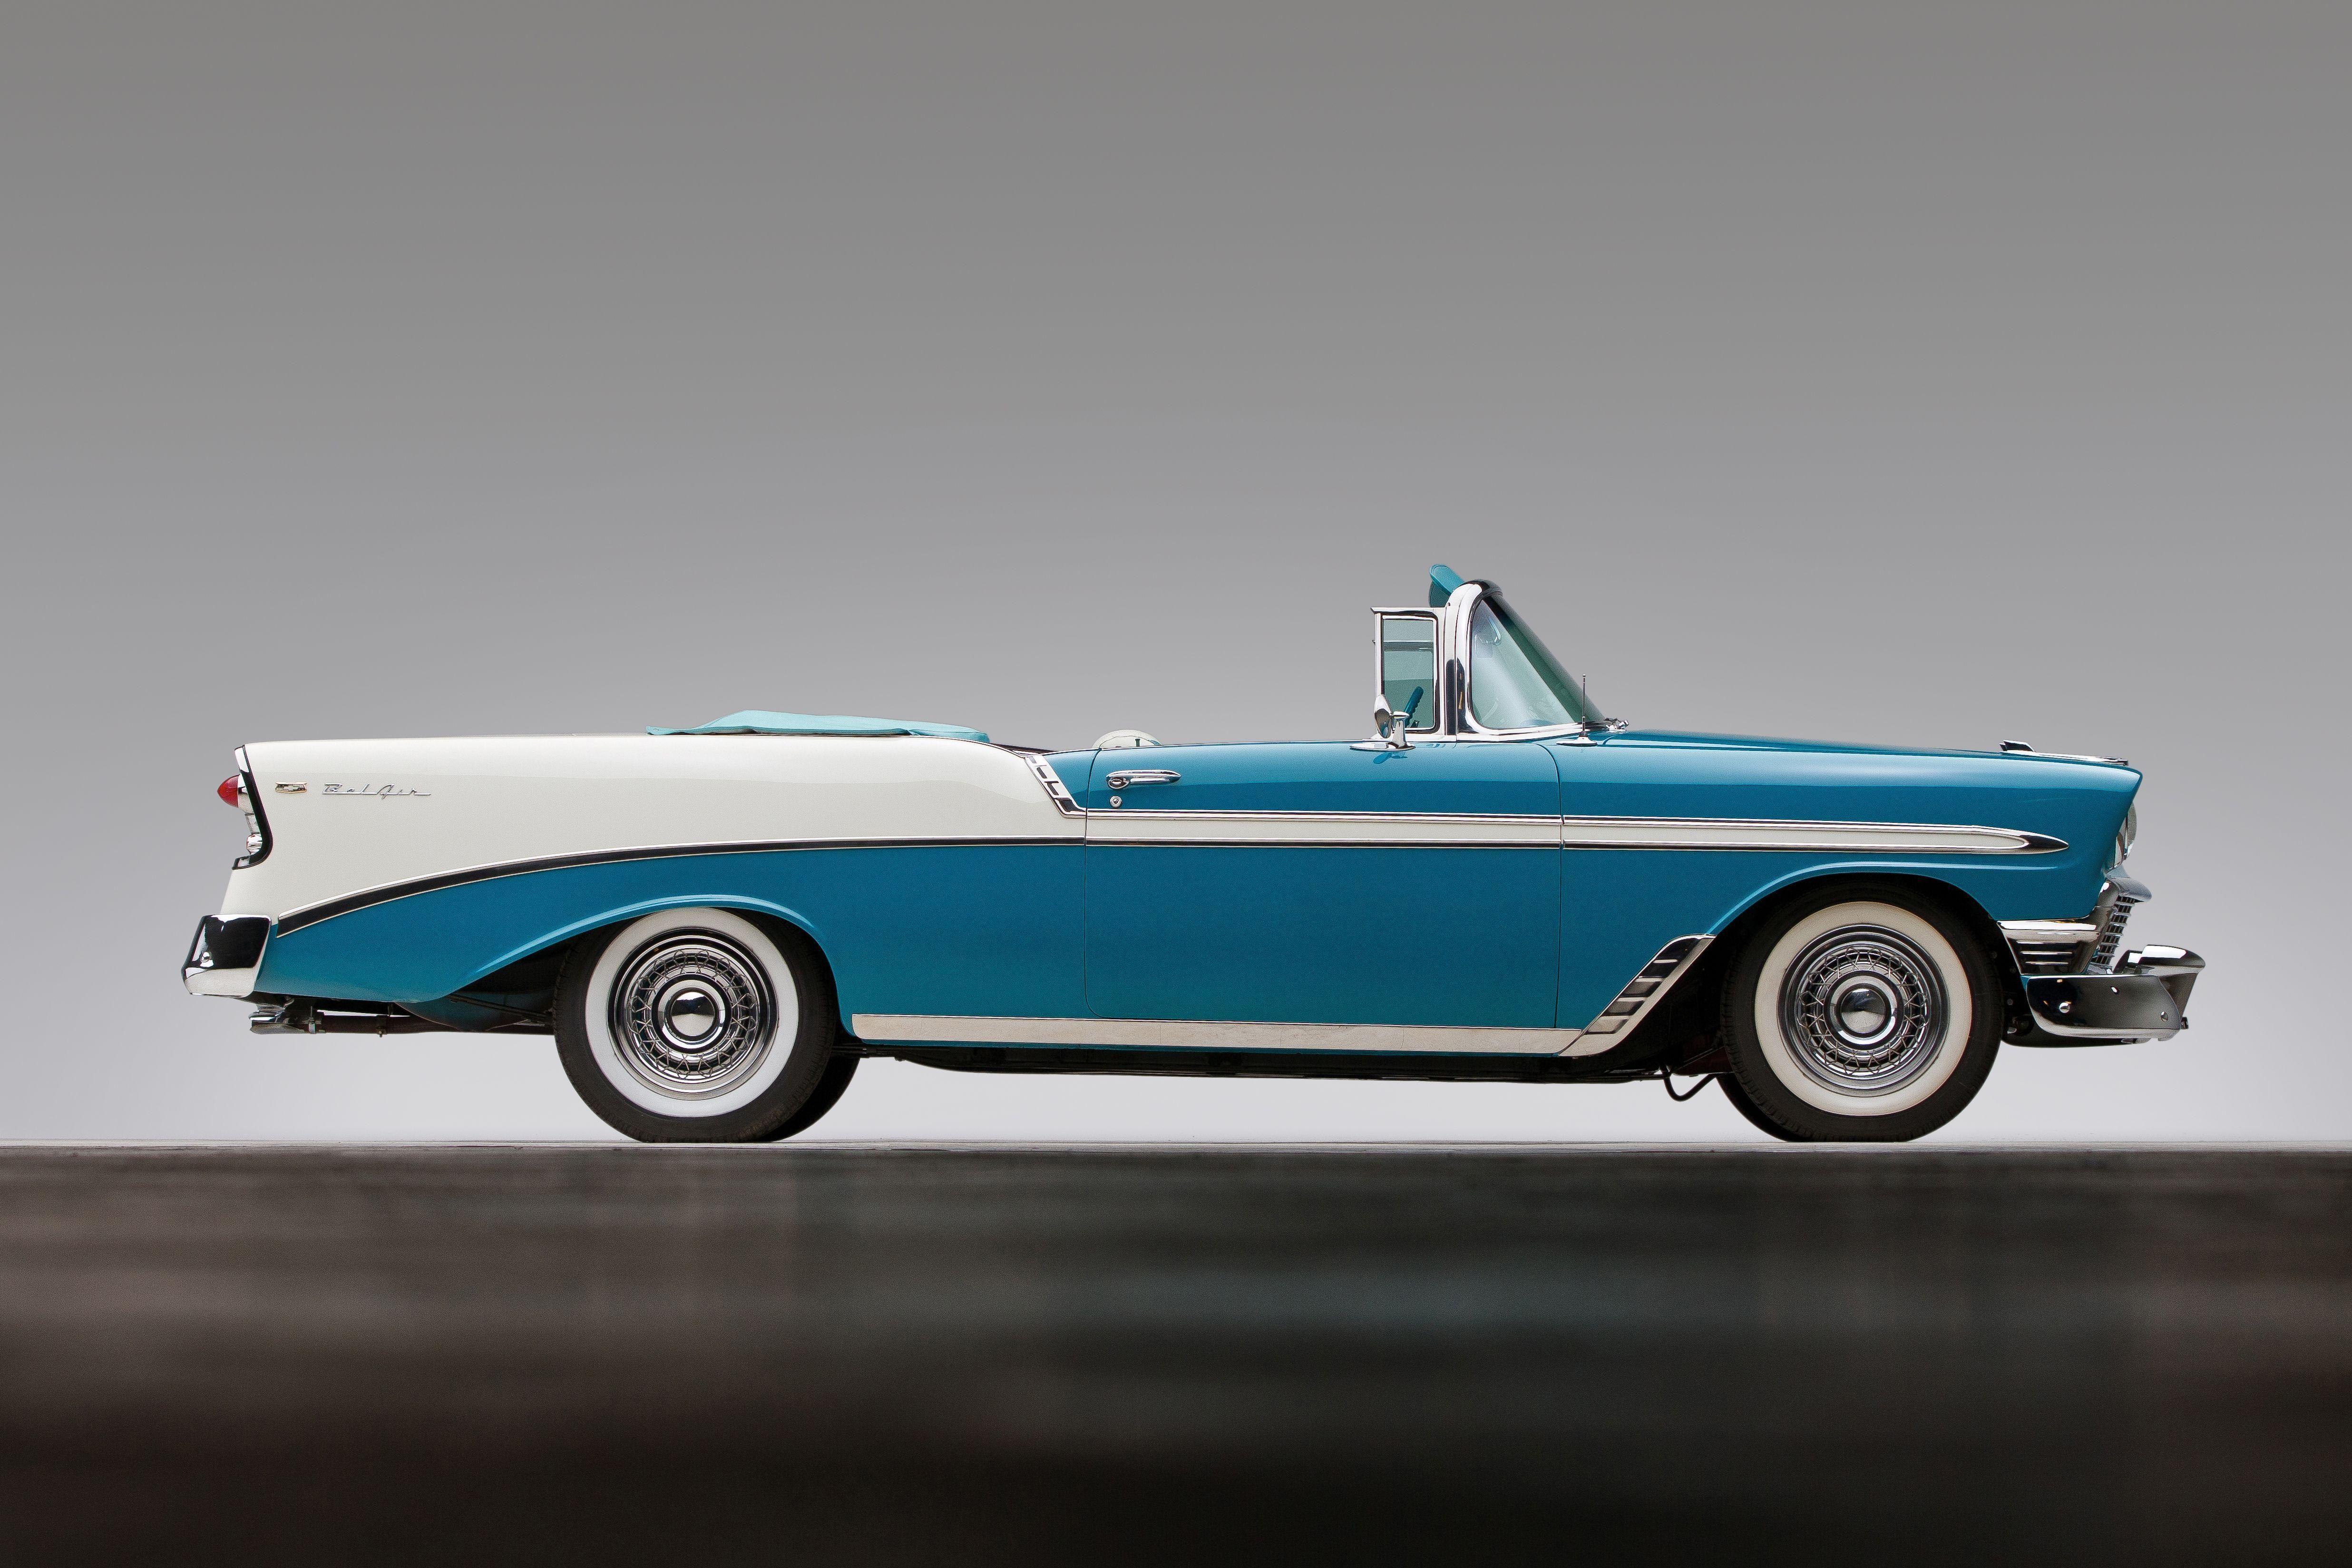 1956 Chevrolet Bel Air Convertible Chevrolet bel air